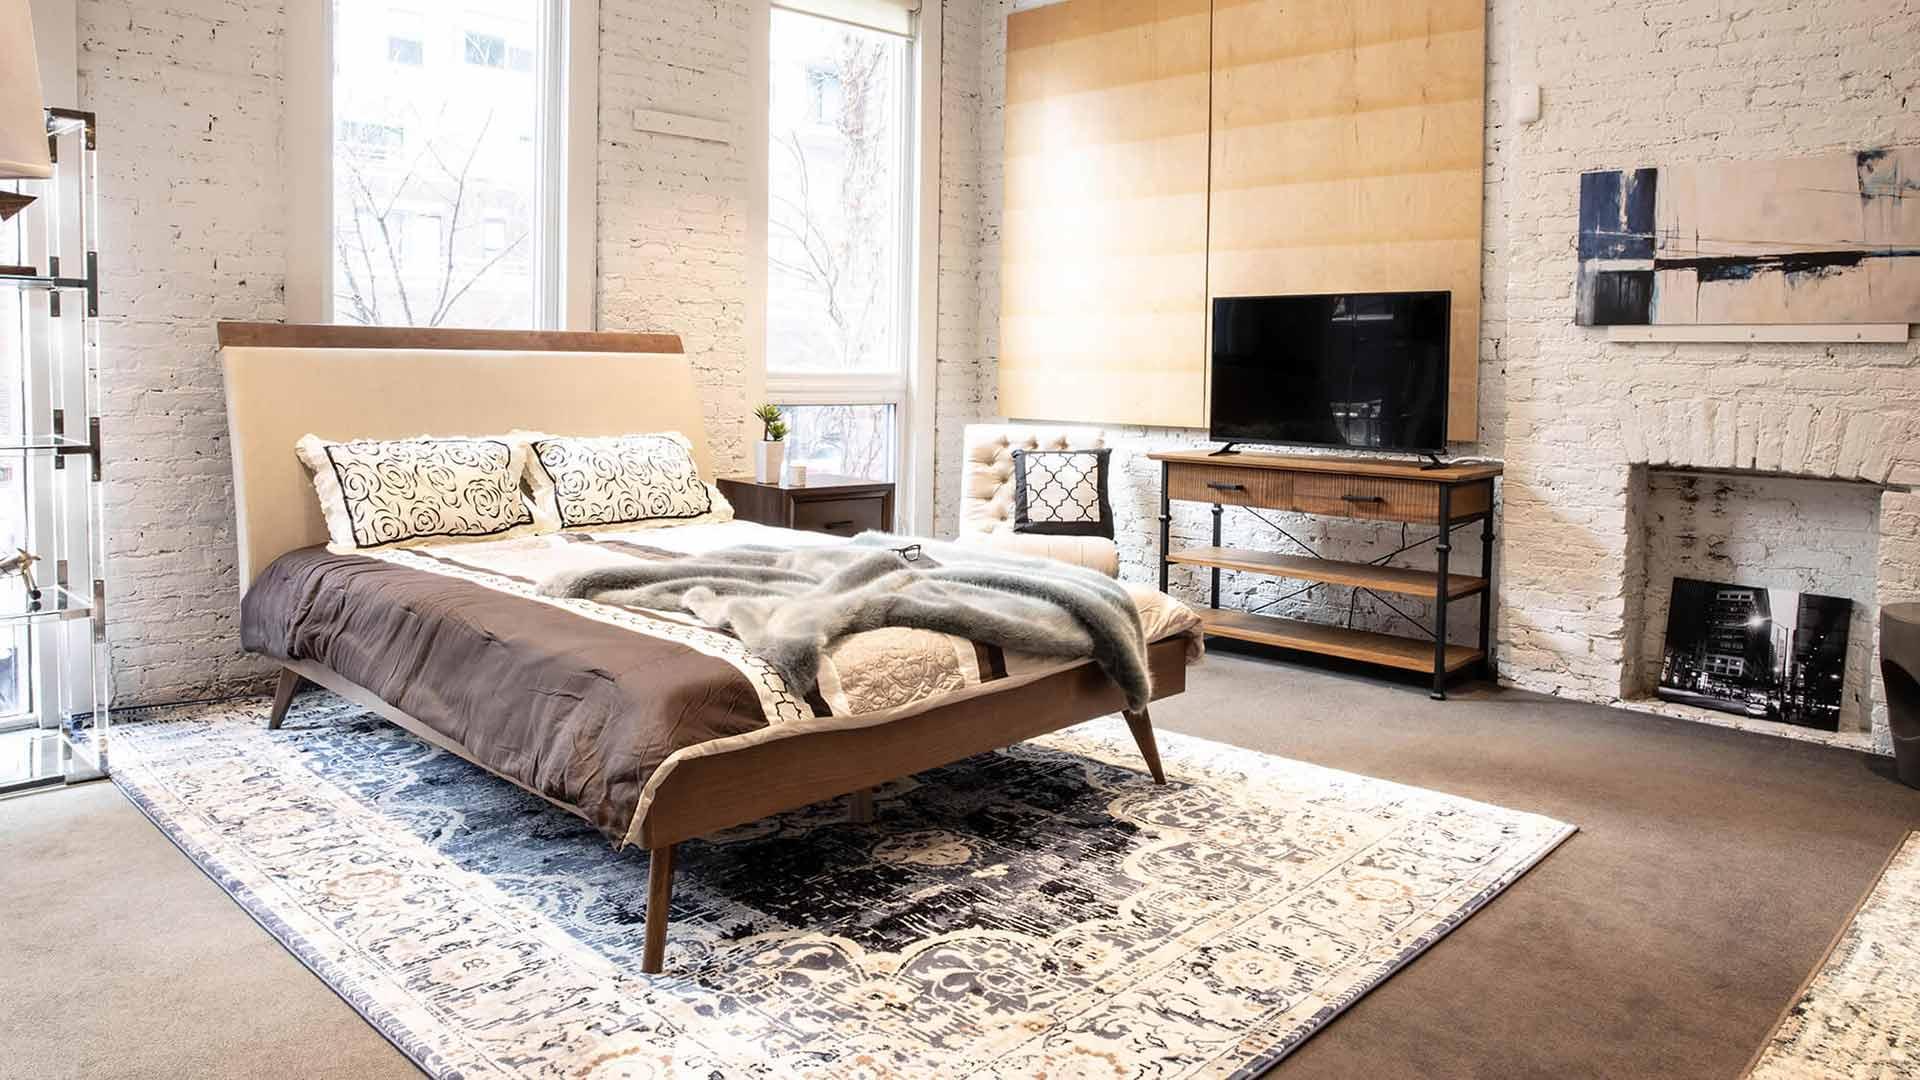 Furniture Rental Milwaukee: Rent Furniture in Milwaukee